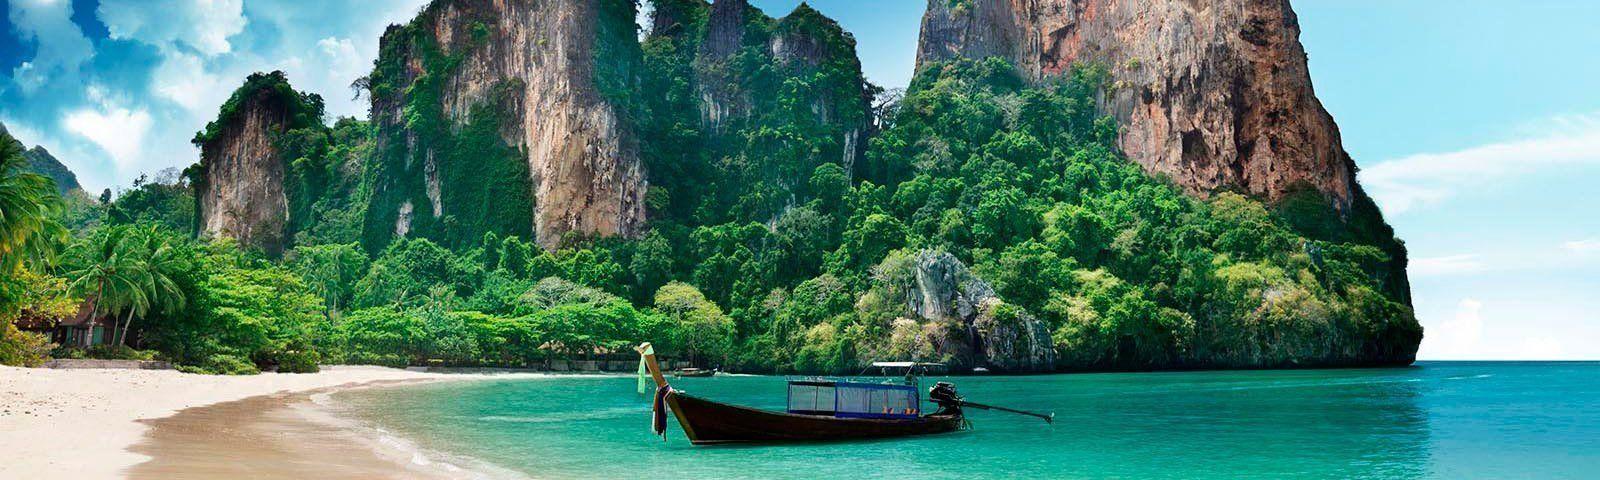 viaje-tailandia-barco-railay-beach